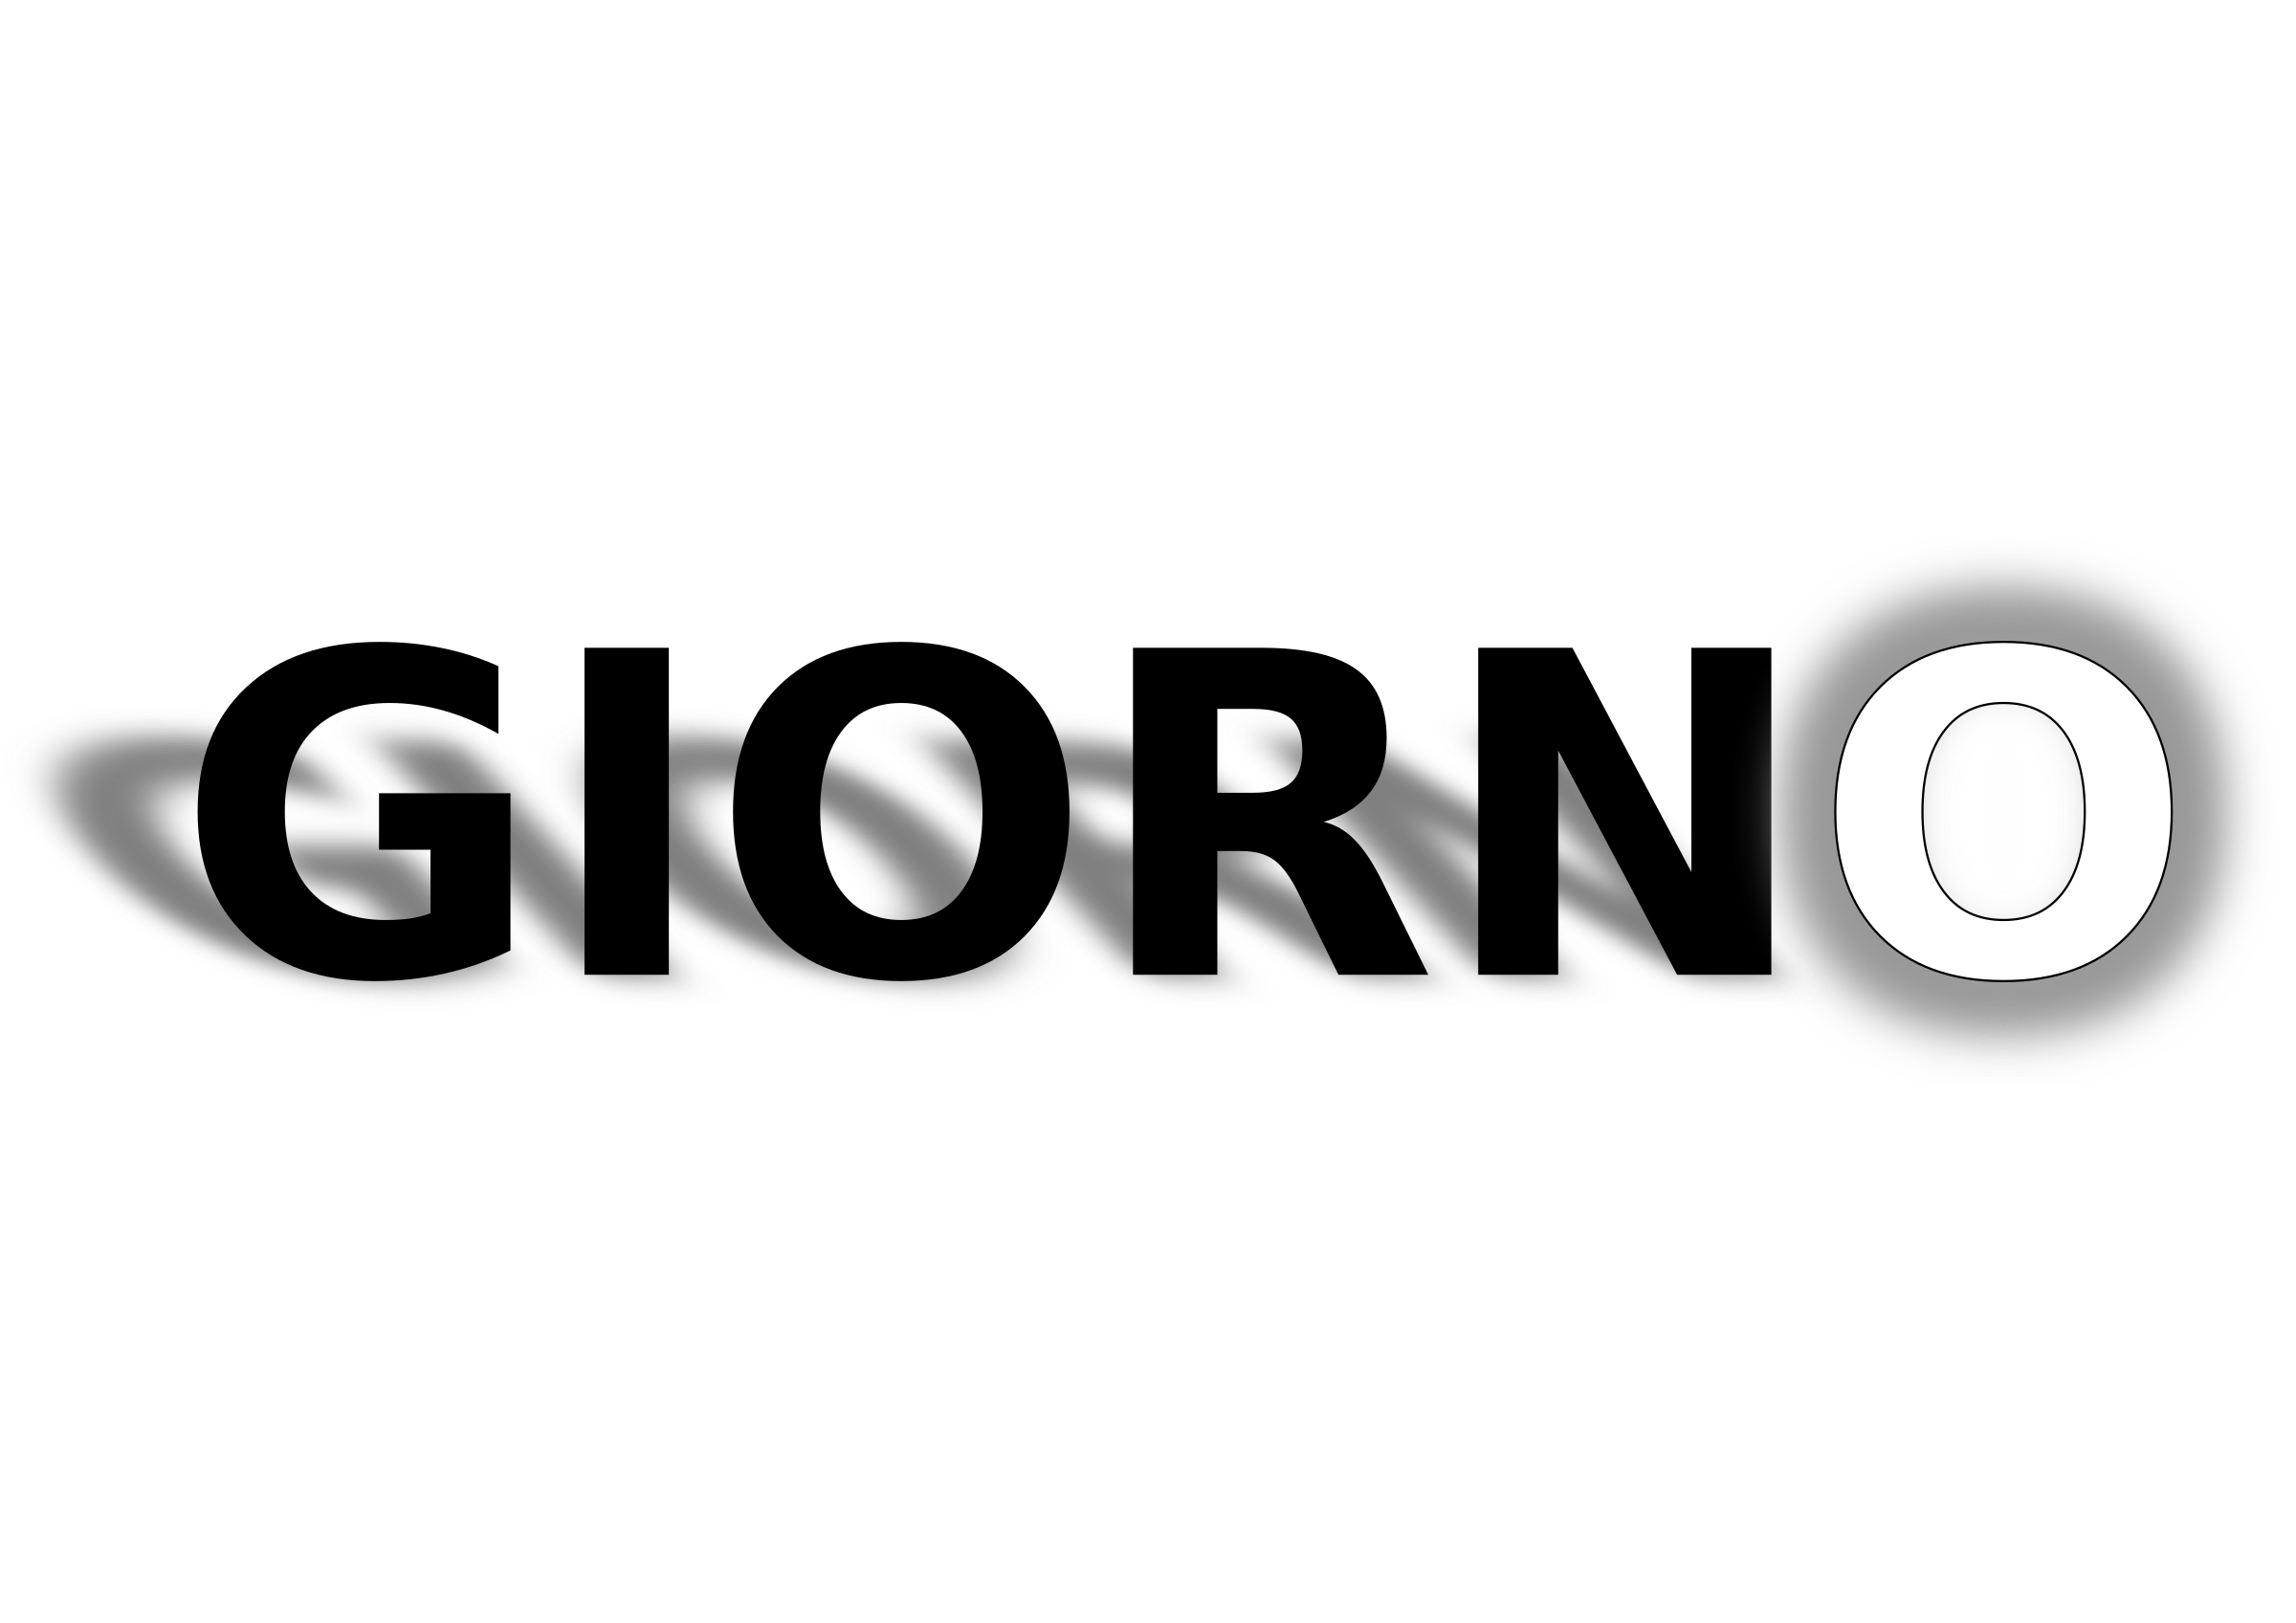 Clipart - GIORNO b0288b54af2e